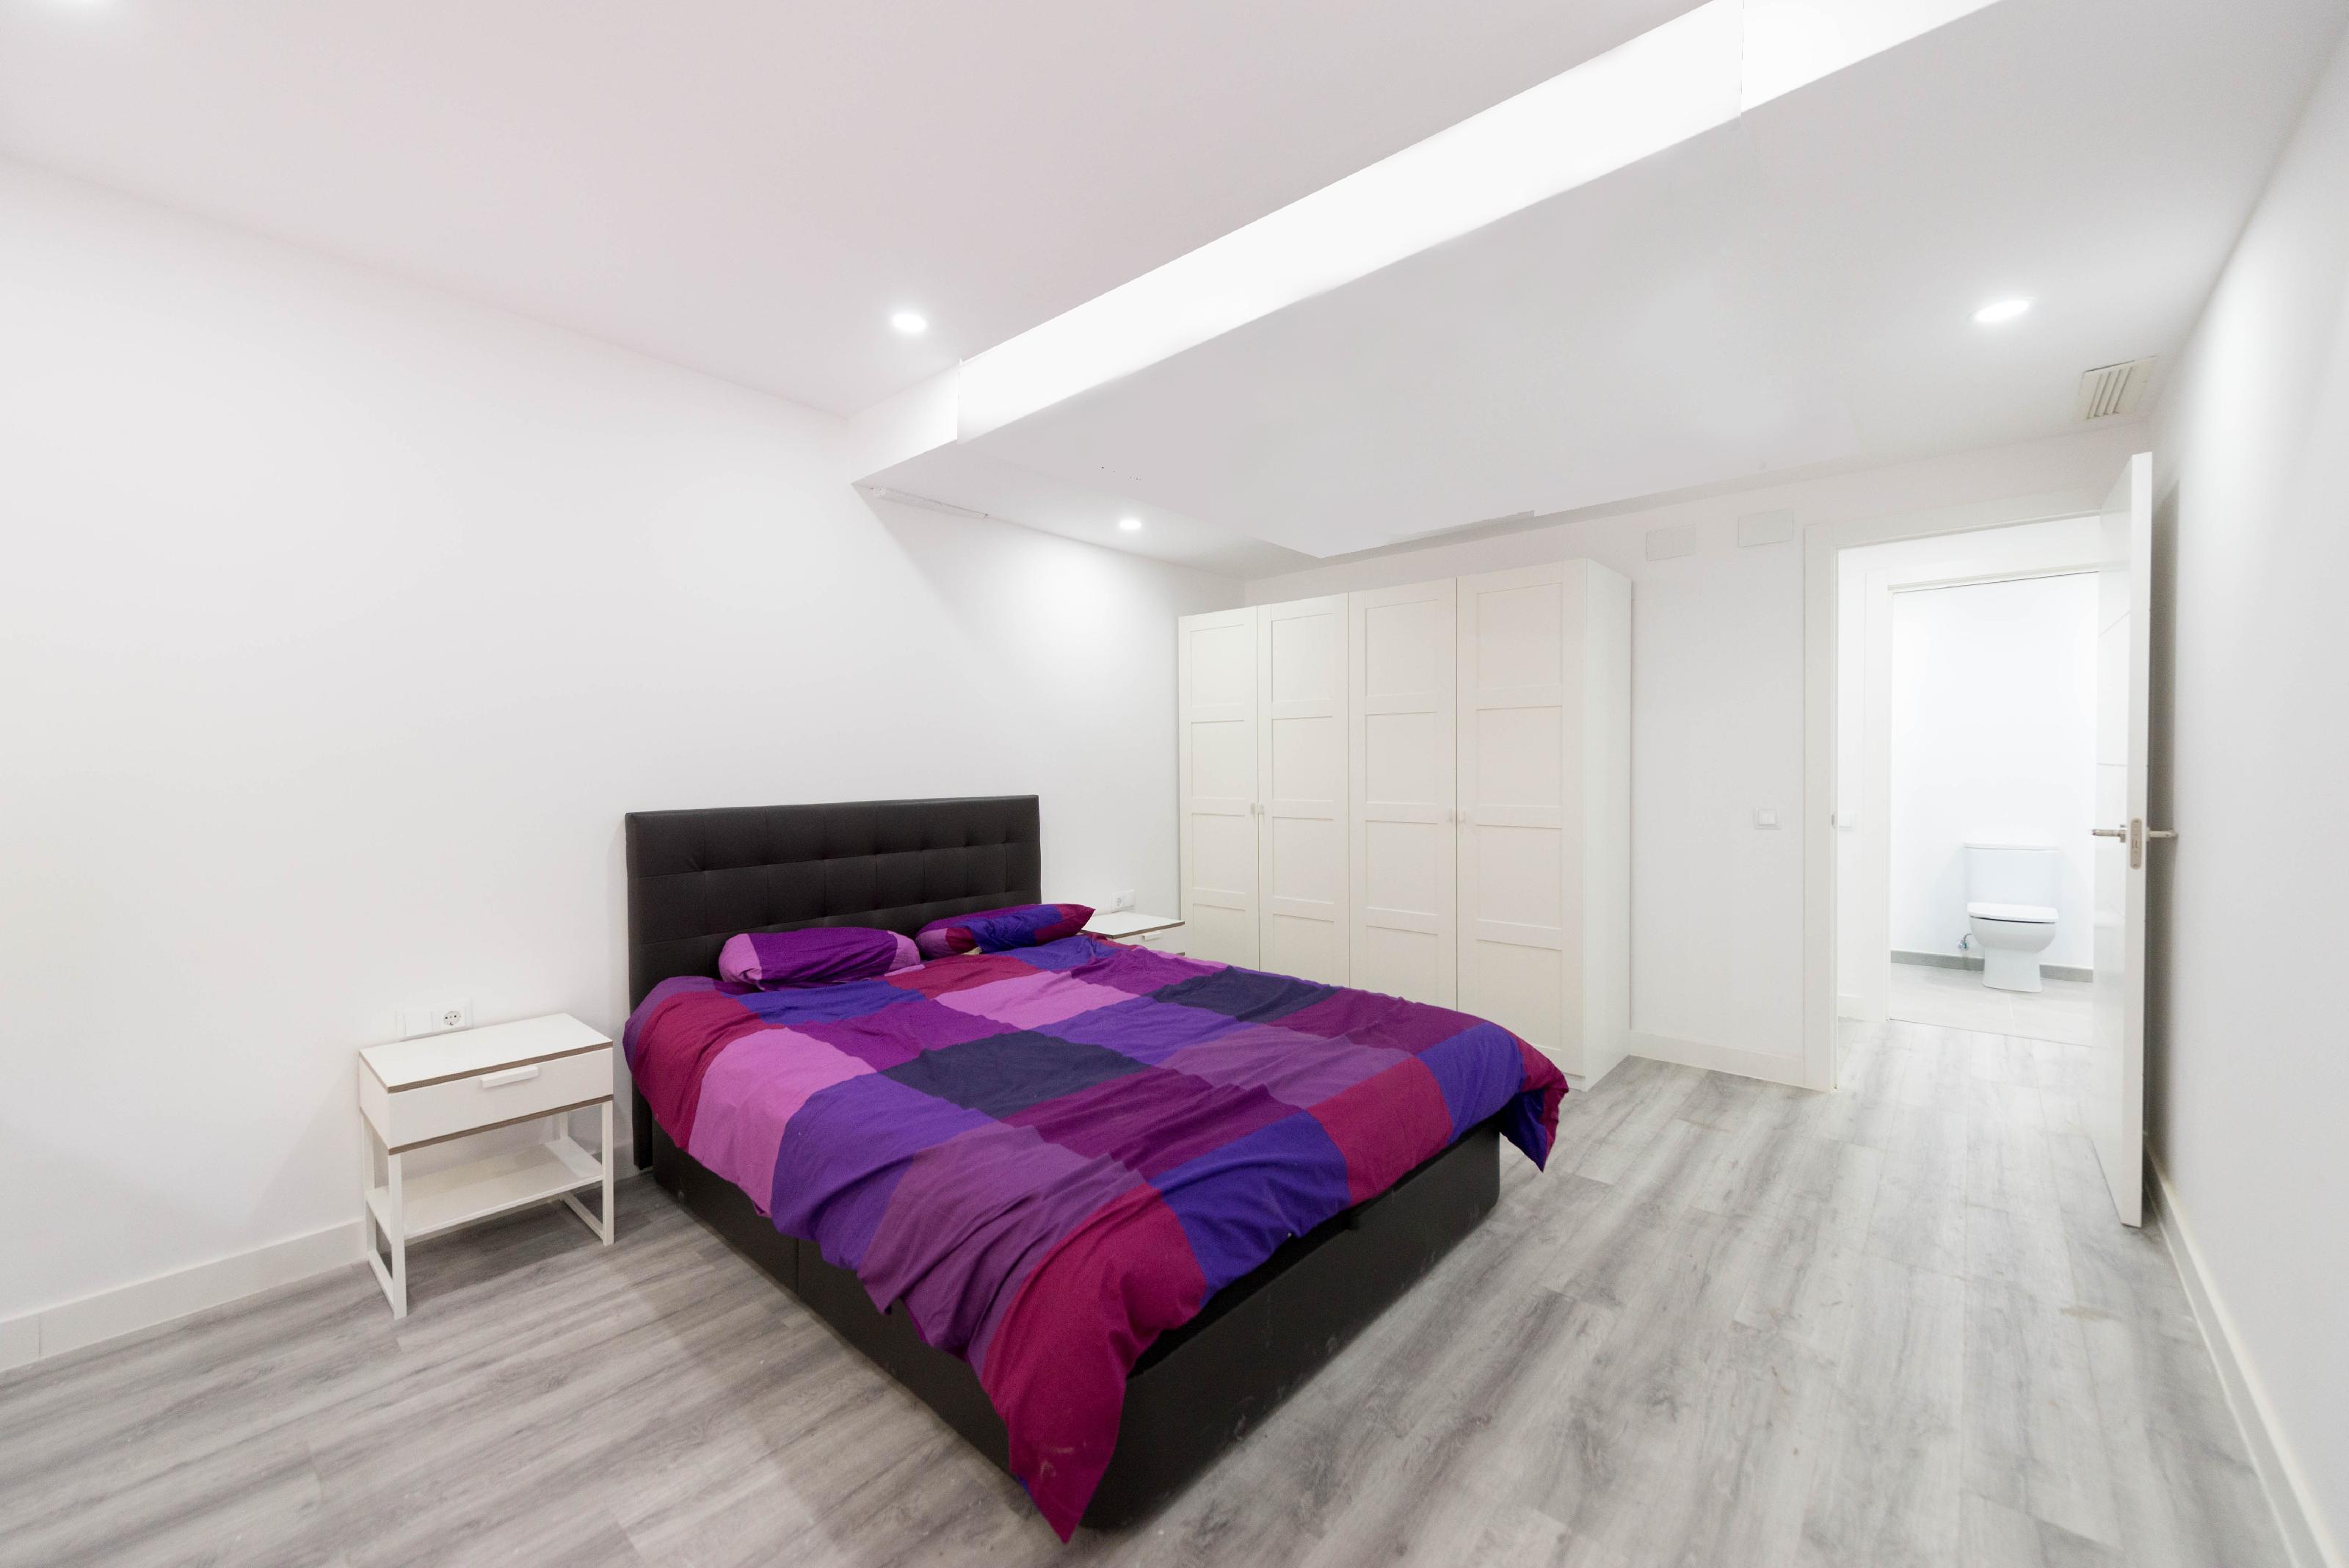 242980 Flat for sale in Eixample, Sagrada Familia 17